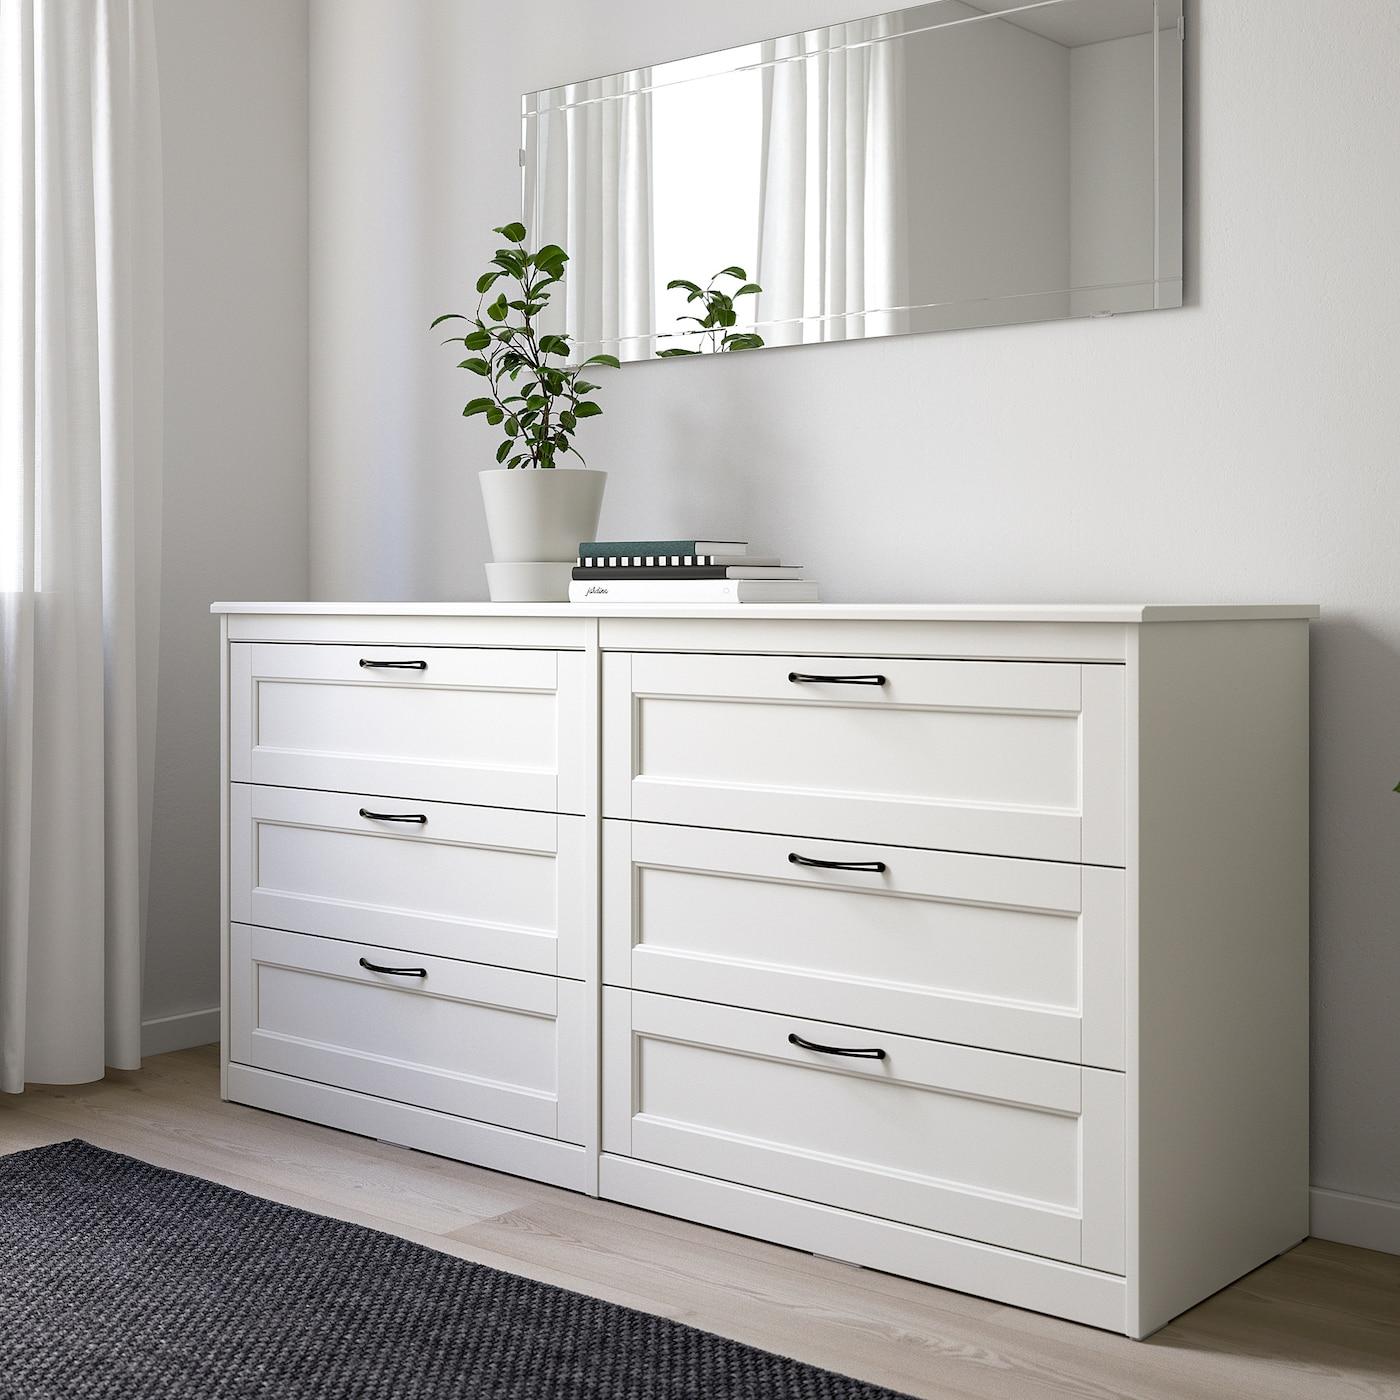 SONGESAND Chest of 6 drawers white 161x81 cm